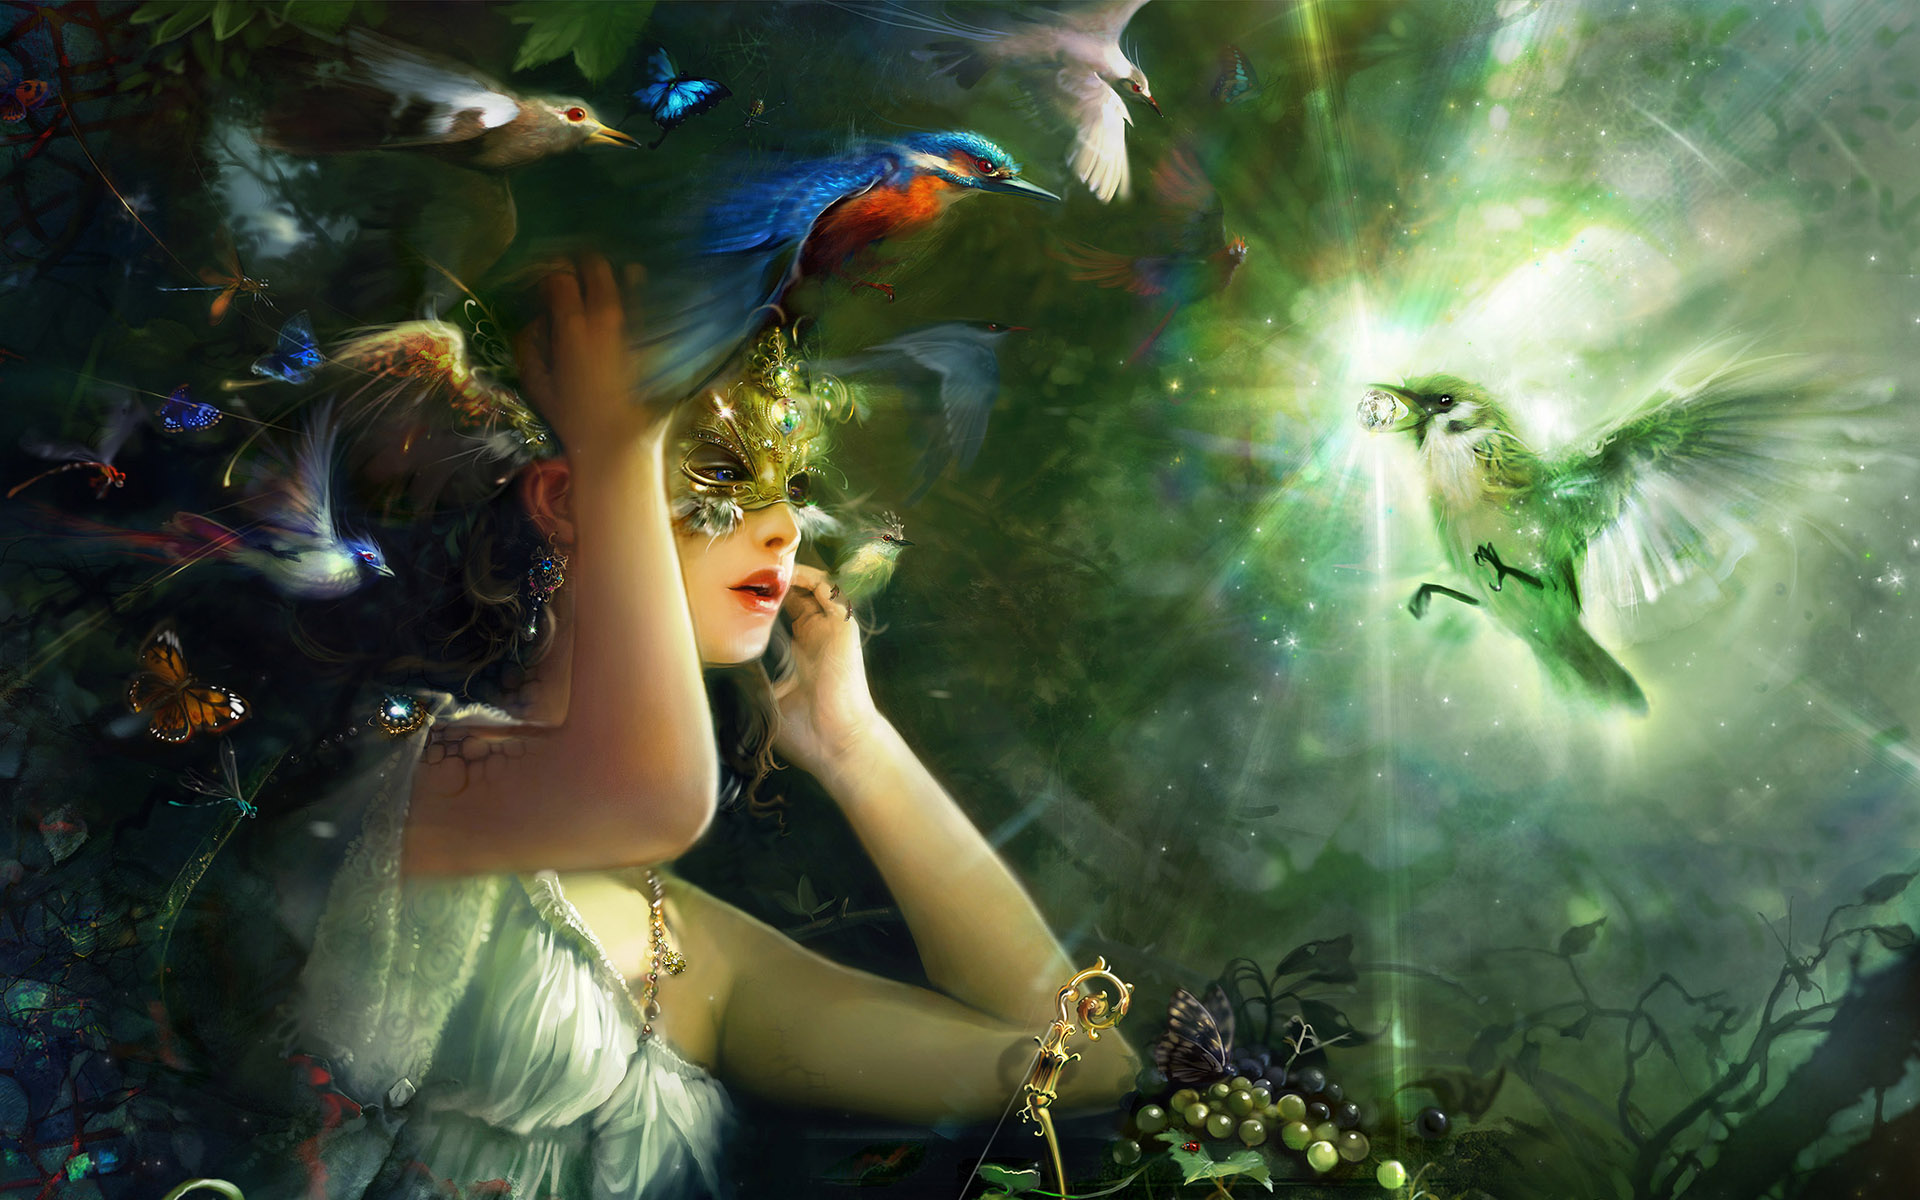 Fairy_Tales_Bird_of_Happiness.jpg